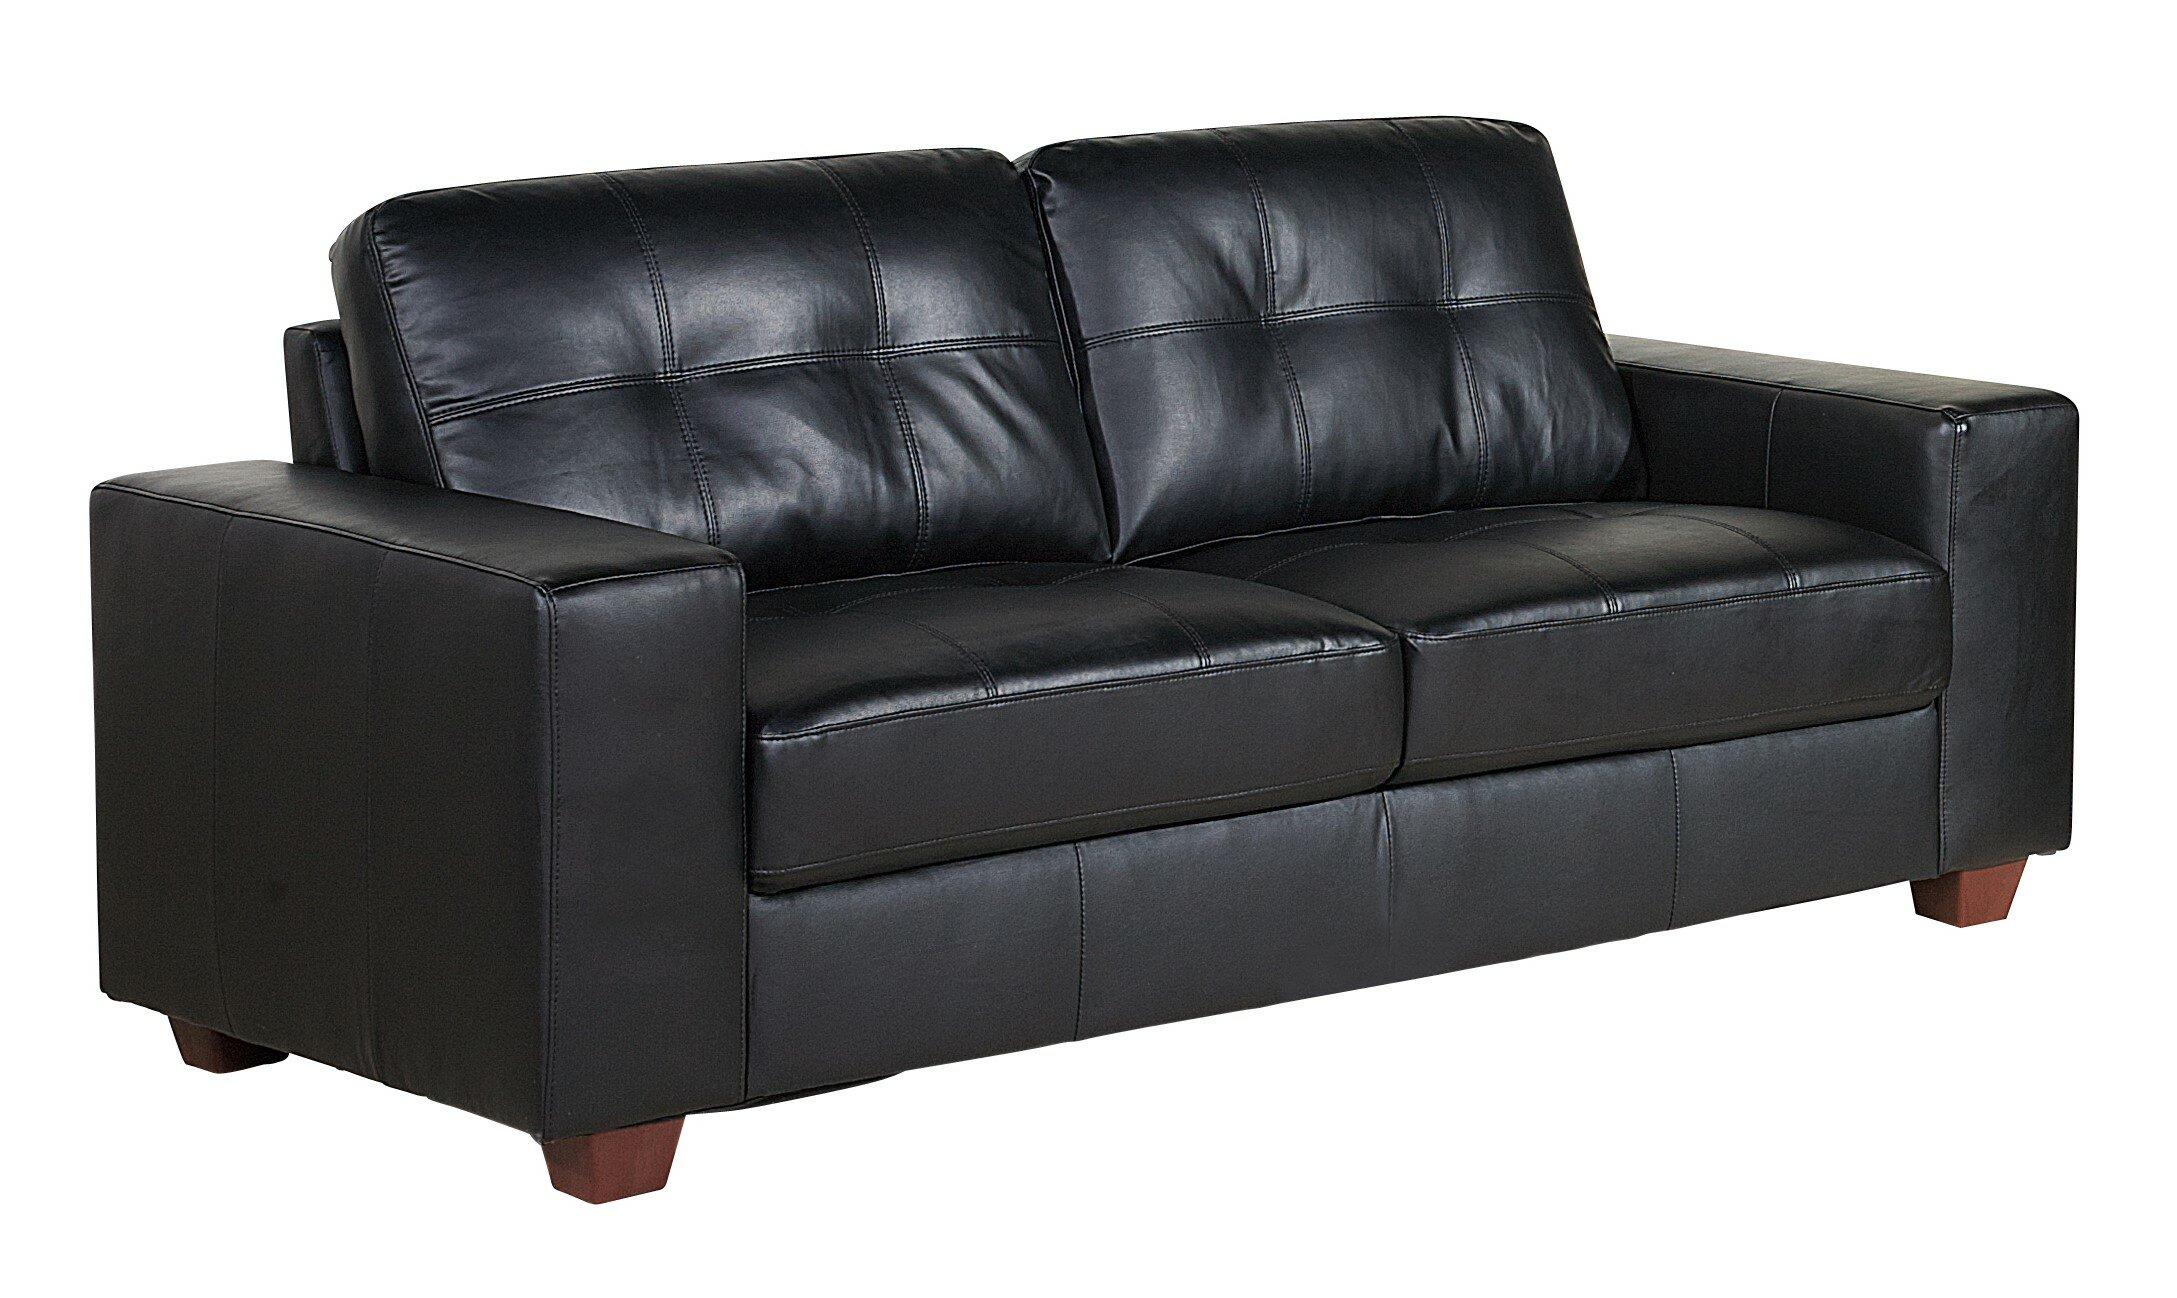 Classicliving Chelmscote 3 Seater Sofa Reviews Wayfair Co Uk